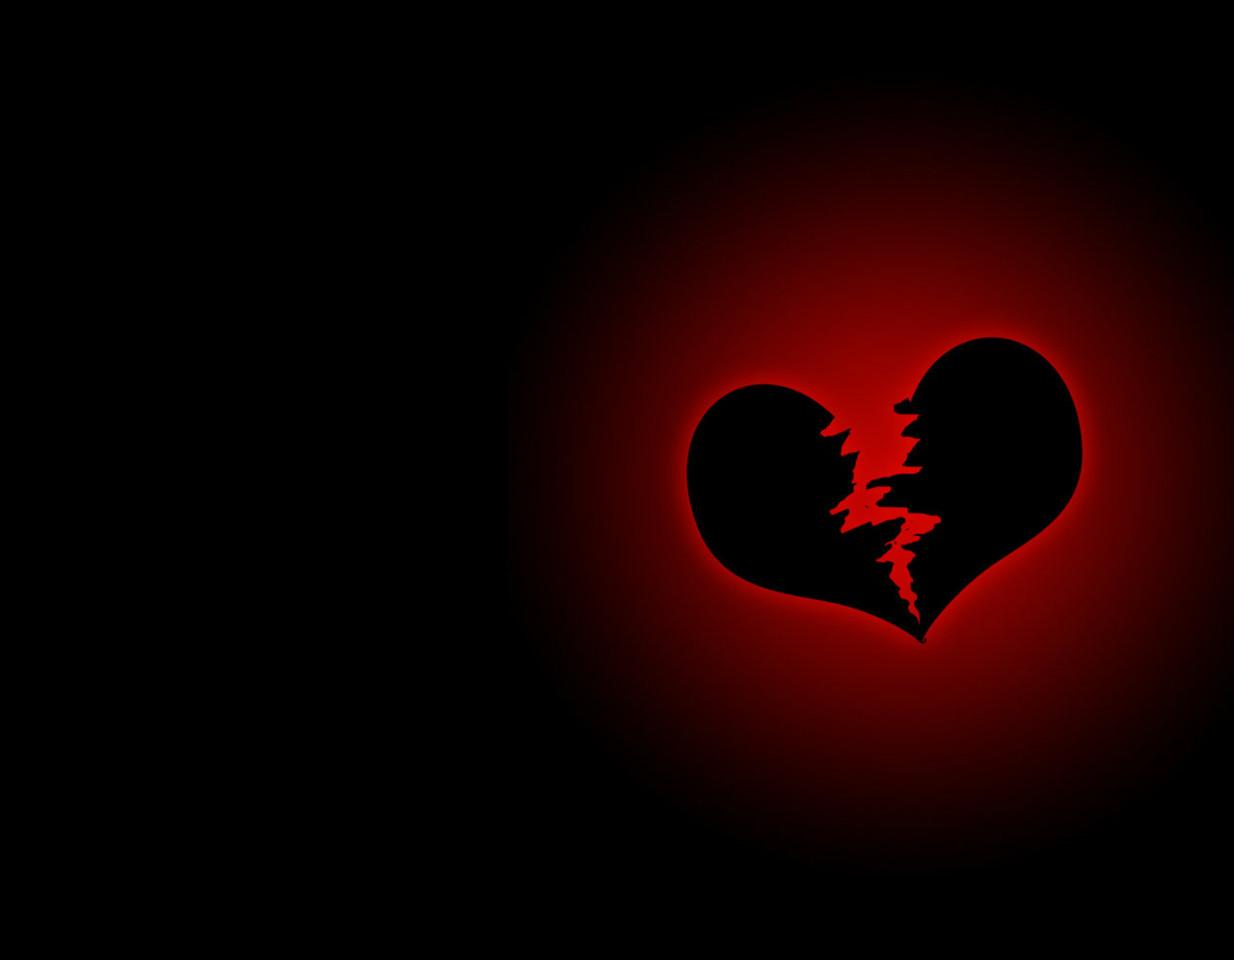 broken_heart_by_admx.jpg